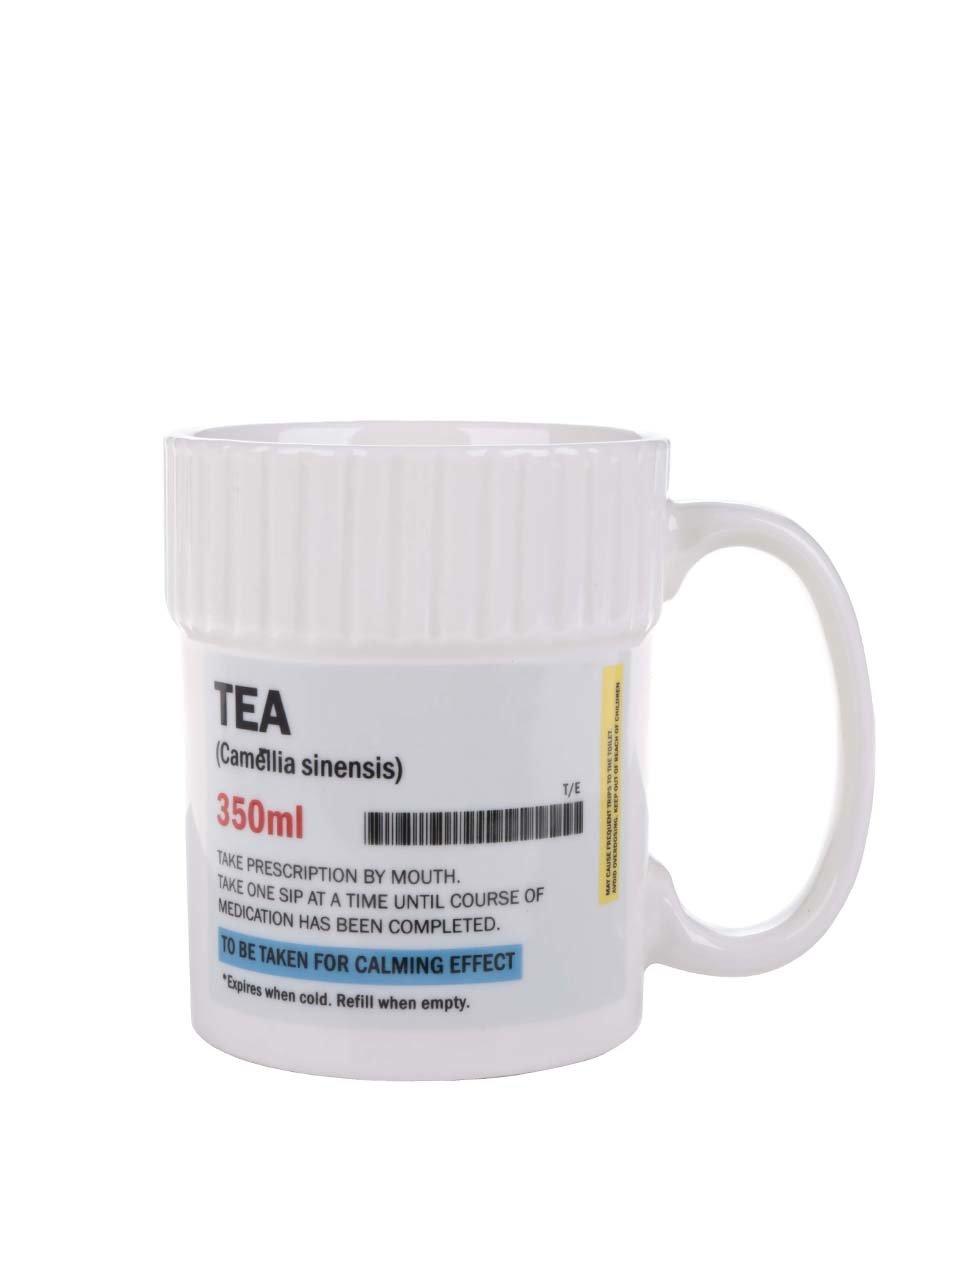 Bílý hrnek na předpis Gift Republic Tea